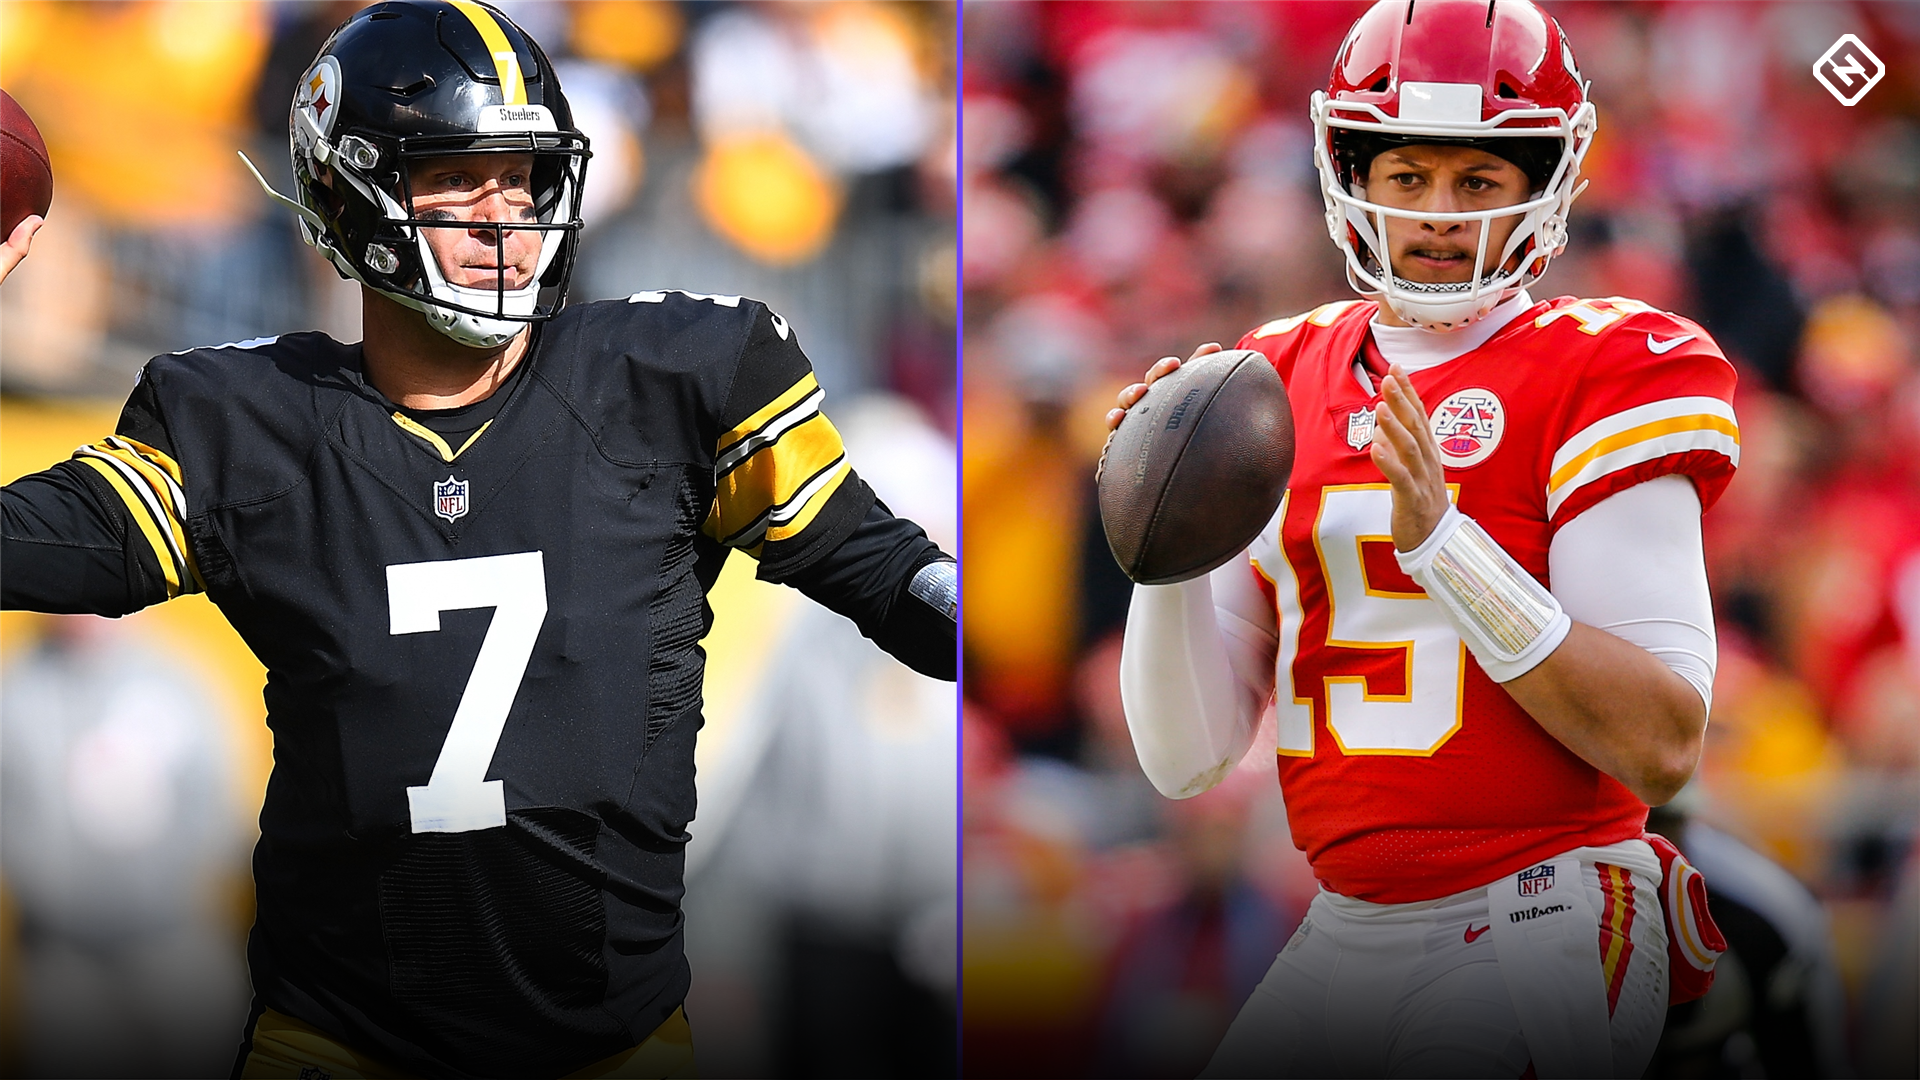 NFL Week 18 Football Betting Odds